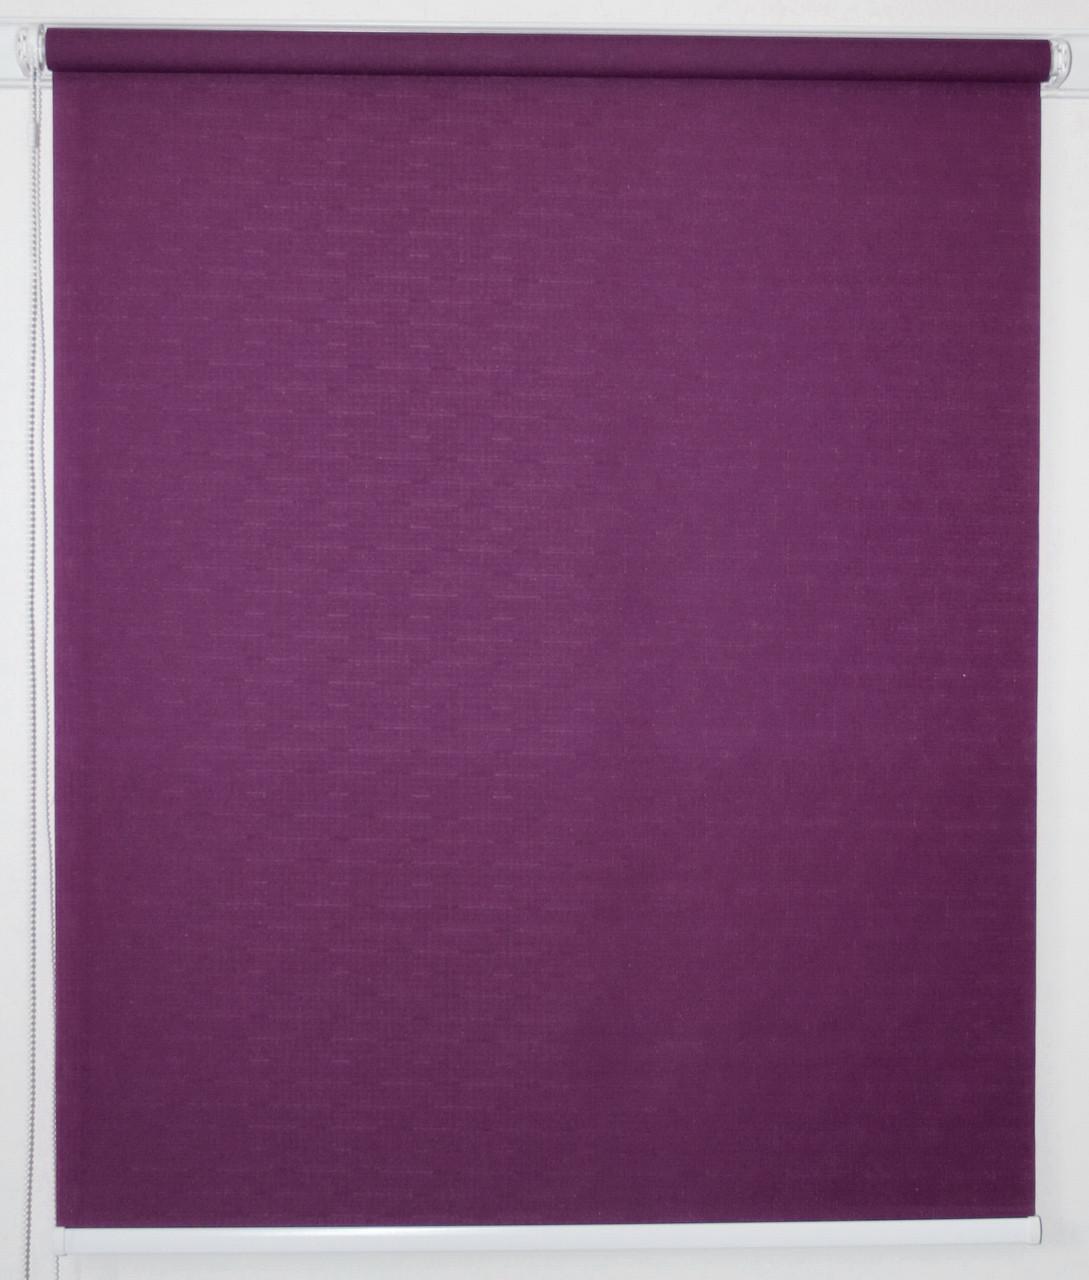 Рулонная штора 650*1500 Лён 613 Фиолетовый